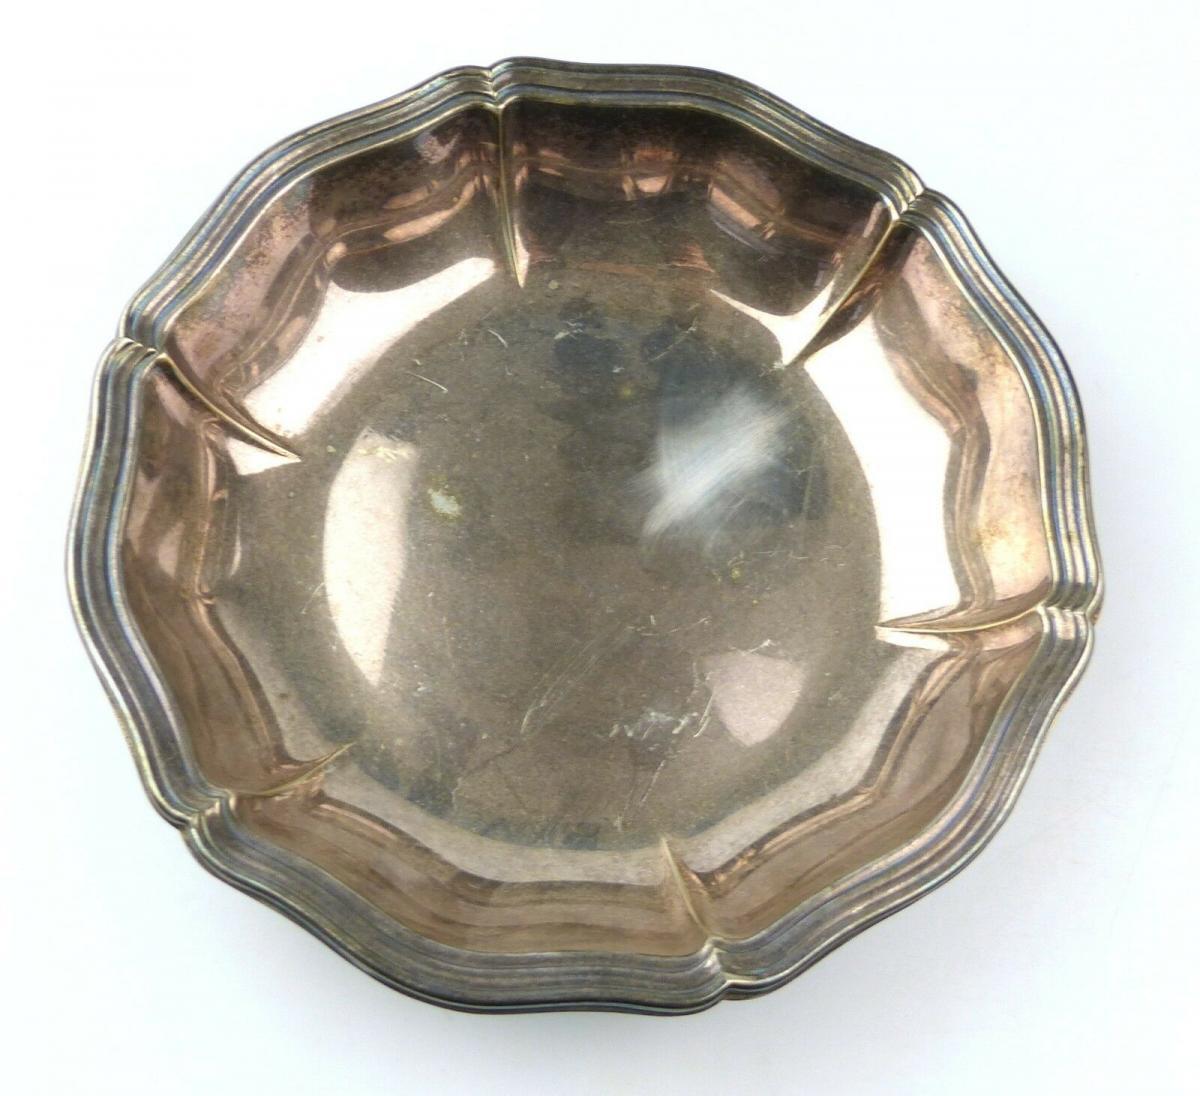 E10384 Wunderschöne große Schale aus 835er Silber WTB